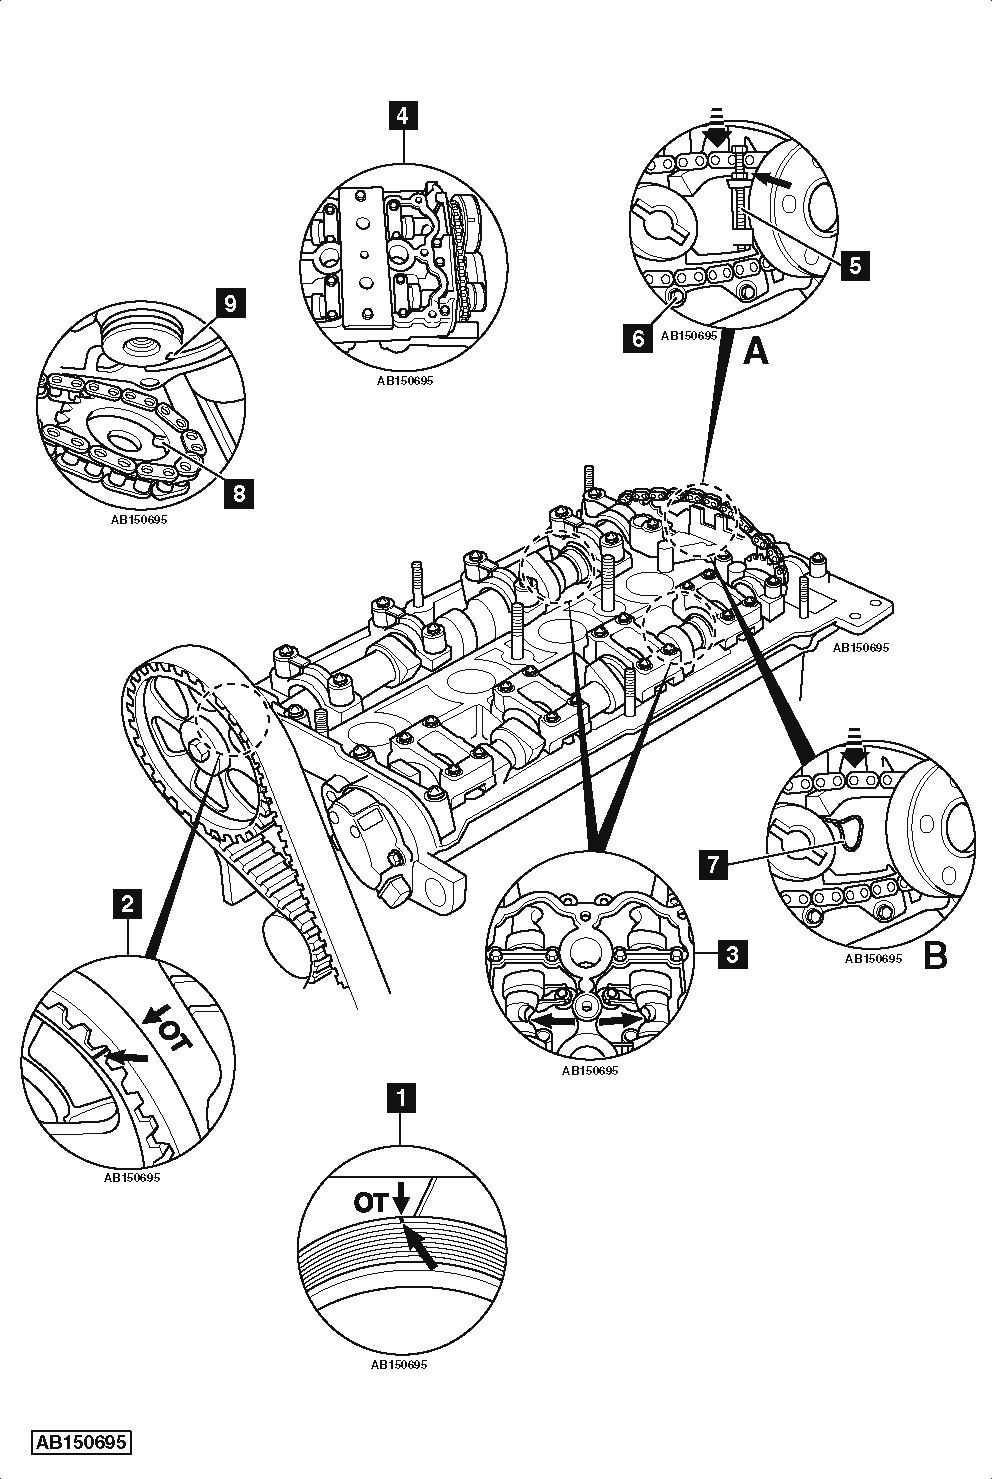 2010 Vw 2 0 Fsi Engine Diagram - Xbox 360 R Jtag Wiring Diagram -  autostereo.aleale1.operazionerestauro.itWiring Diagram Resource